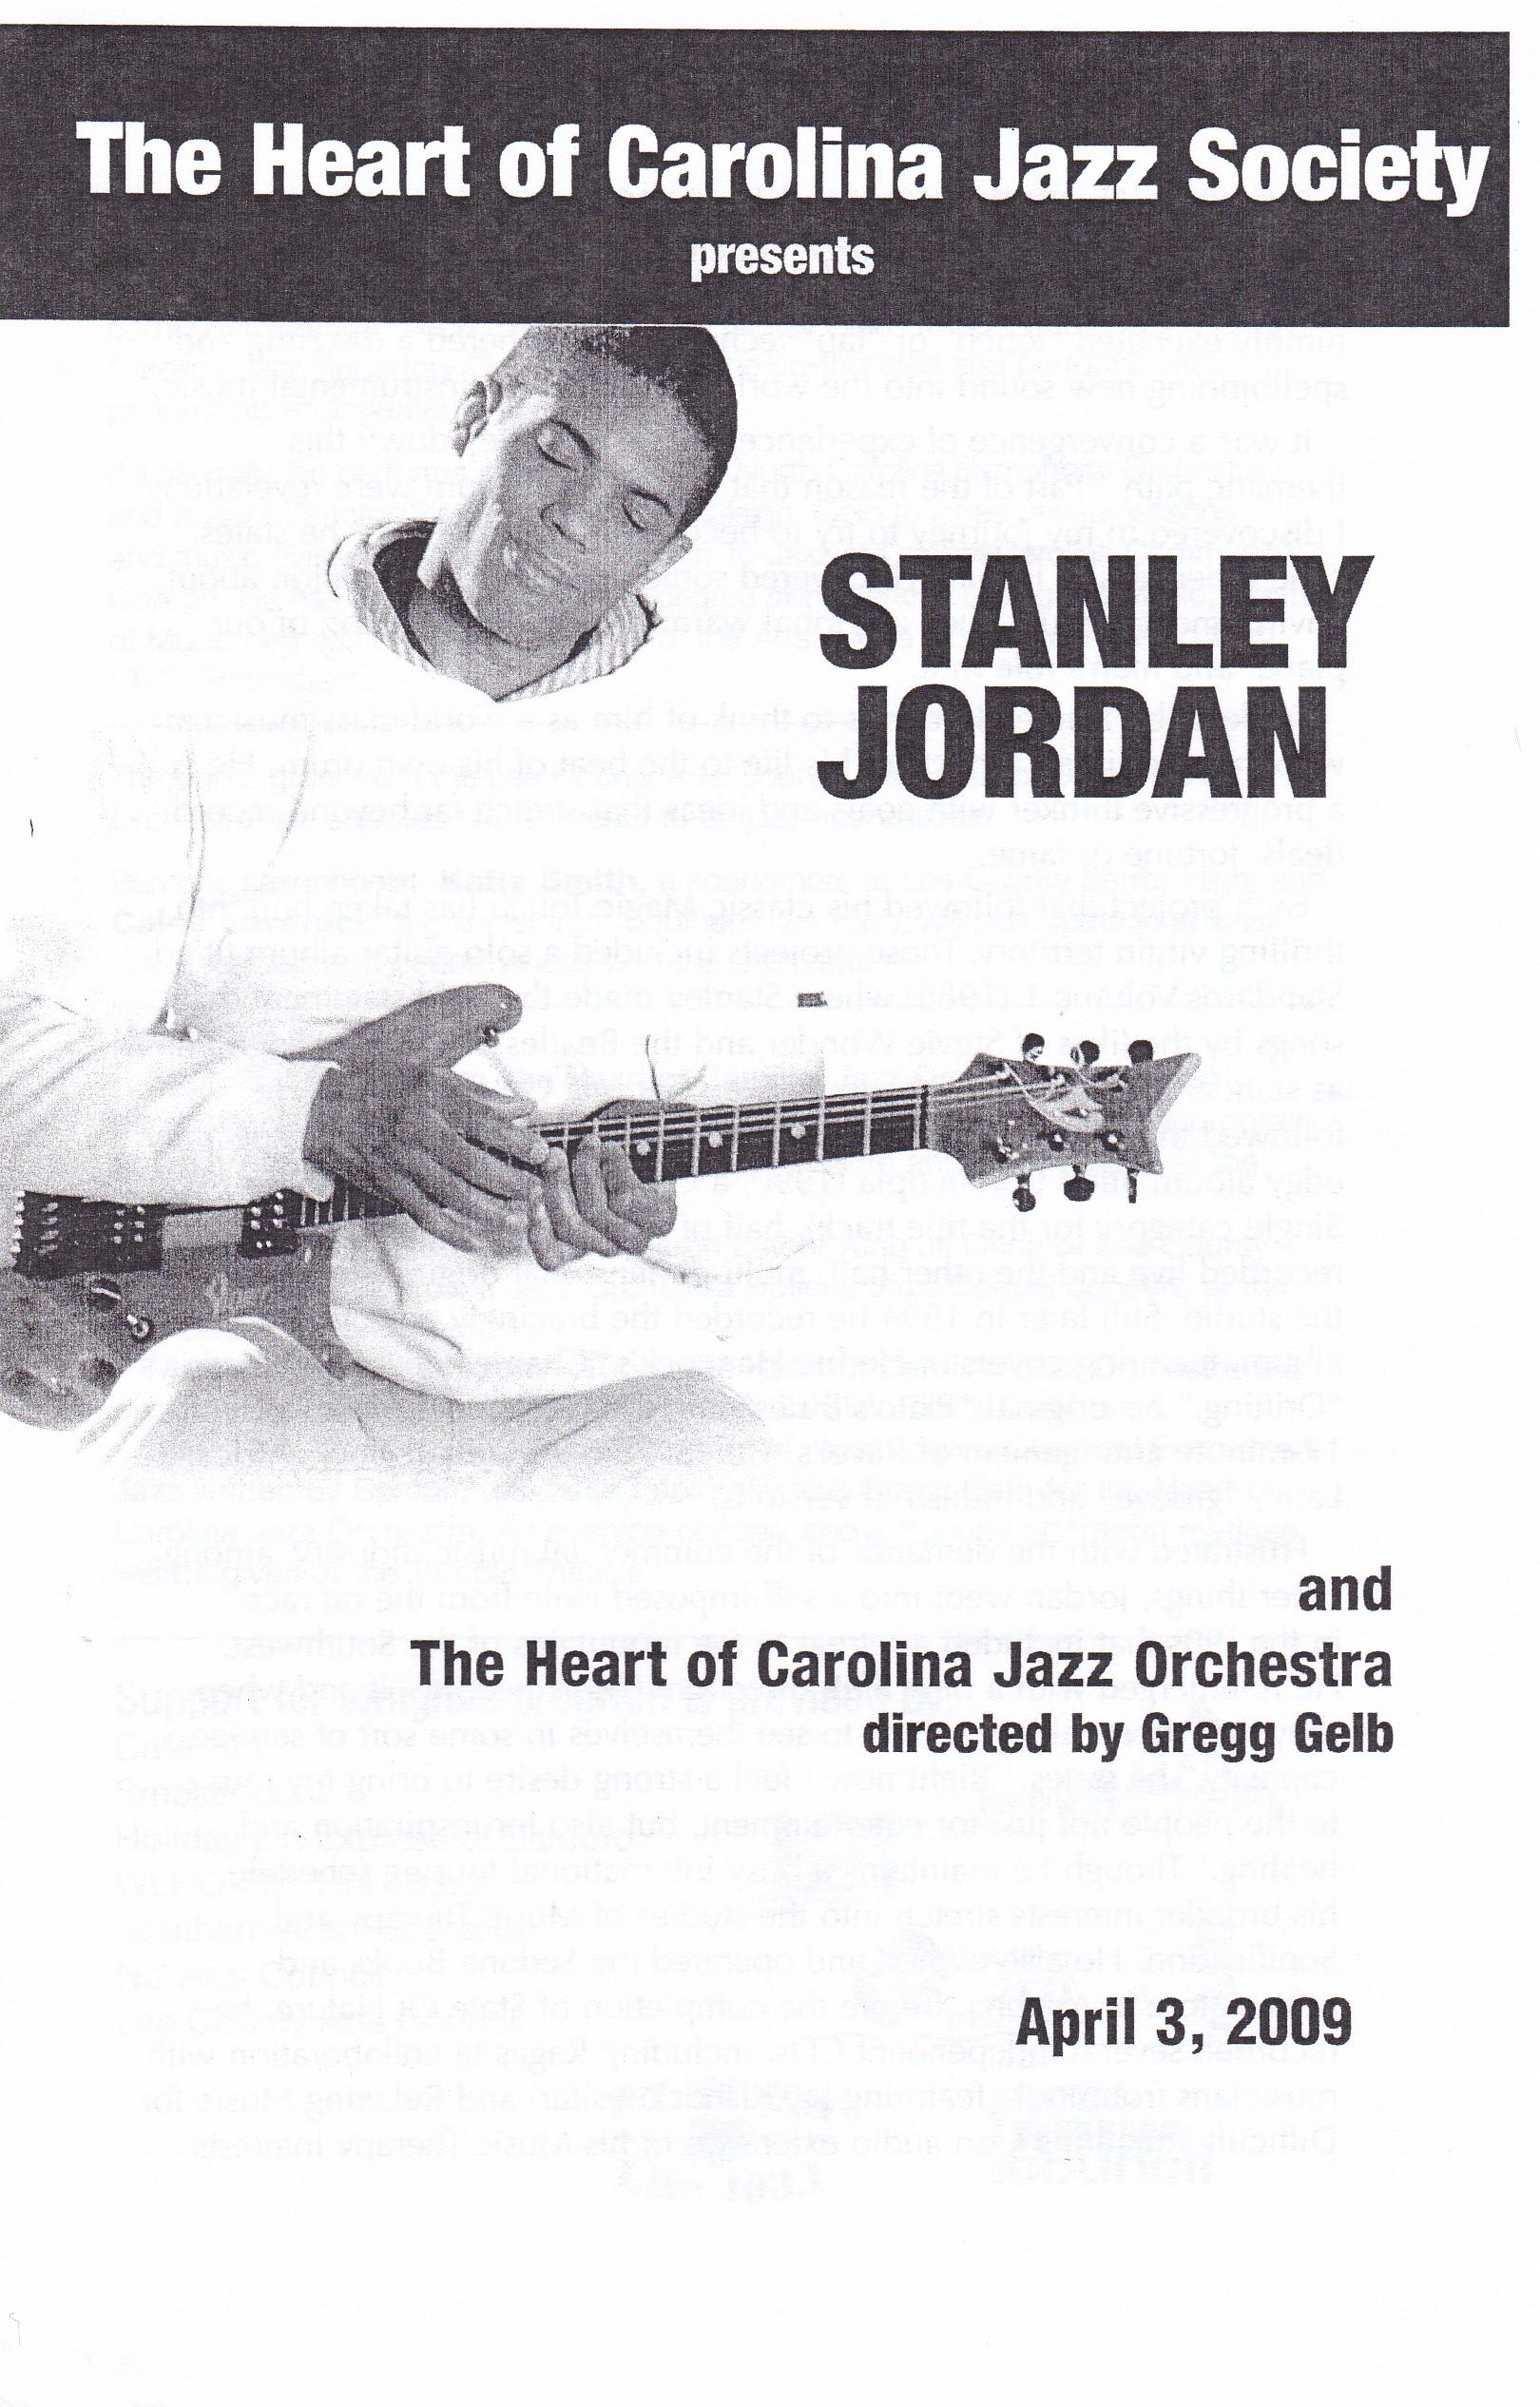 HOCJO-Guest-artists-Stanley-Jordan-program